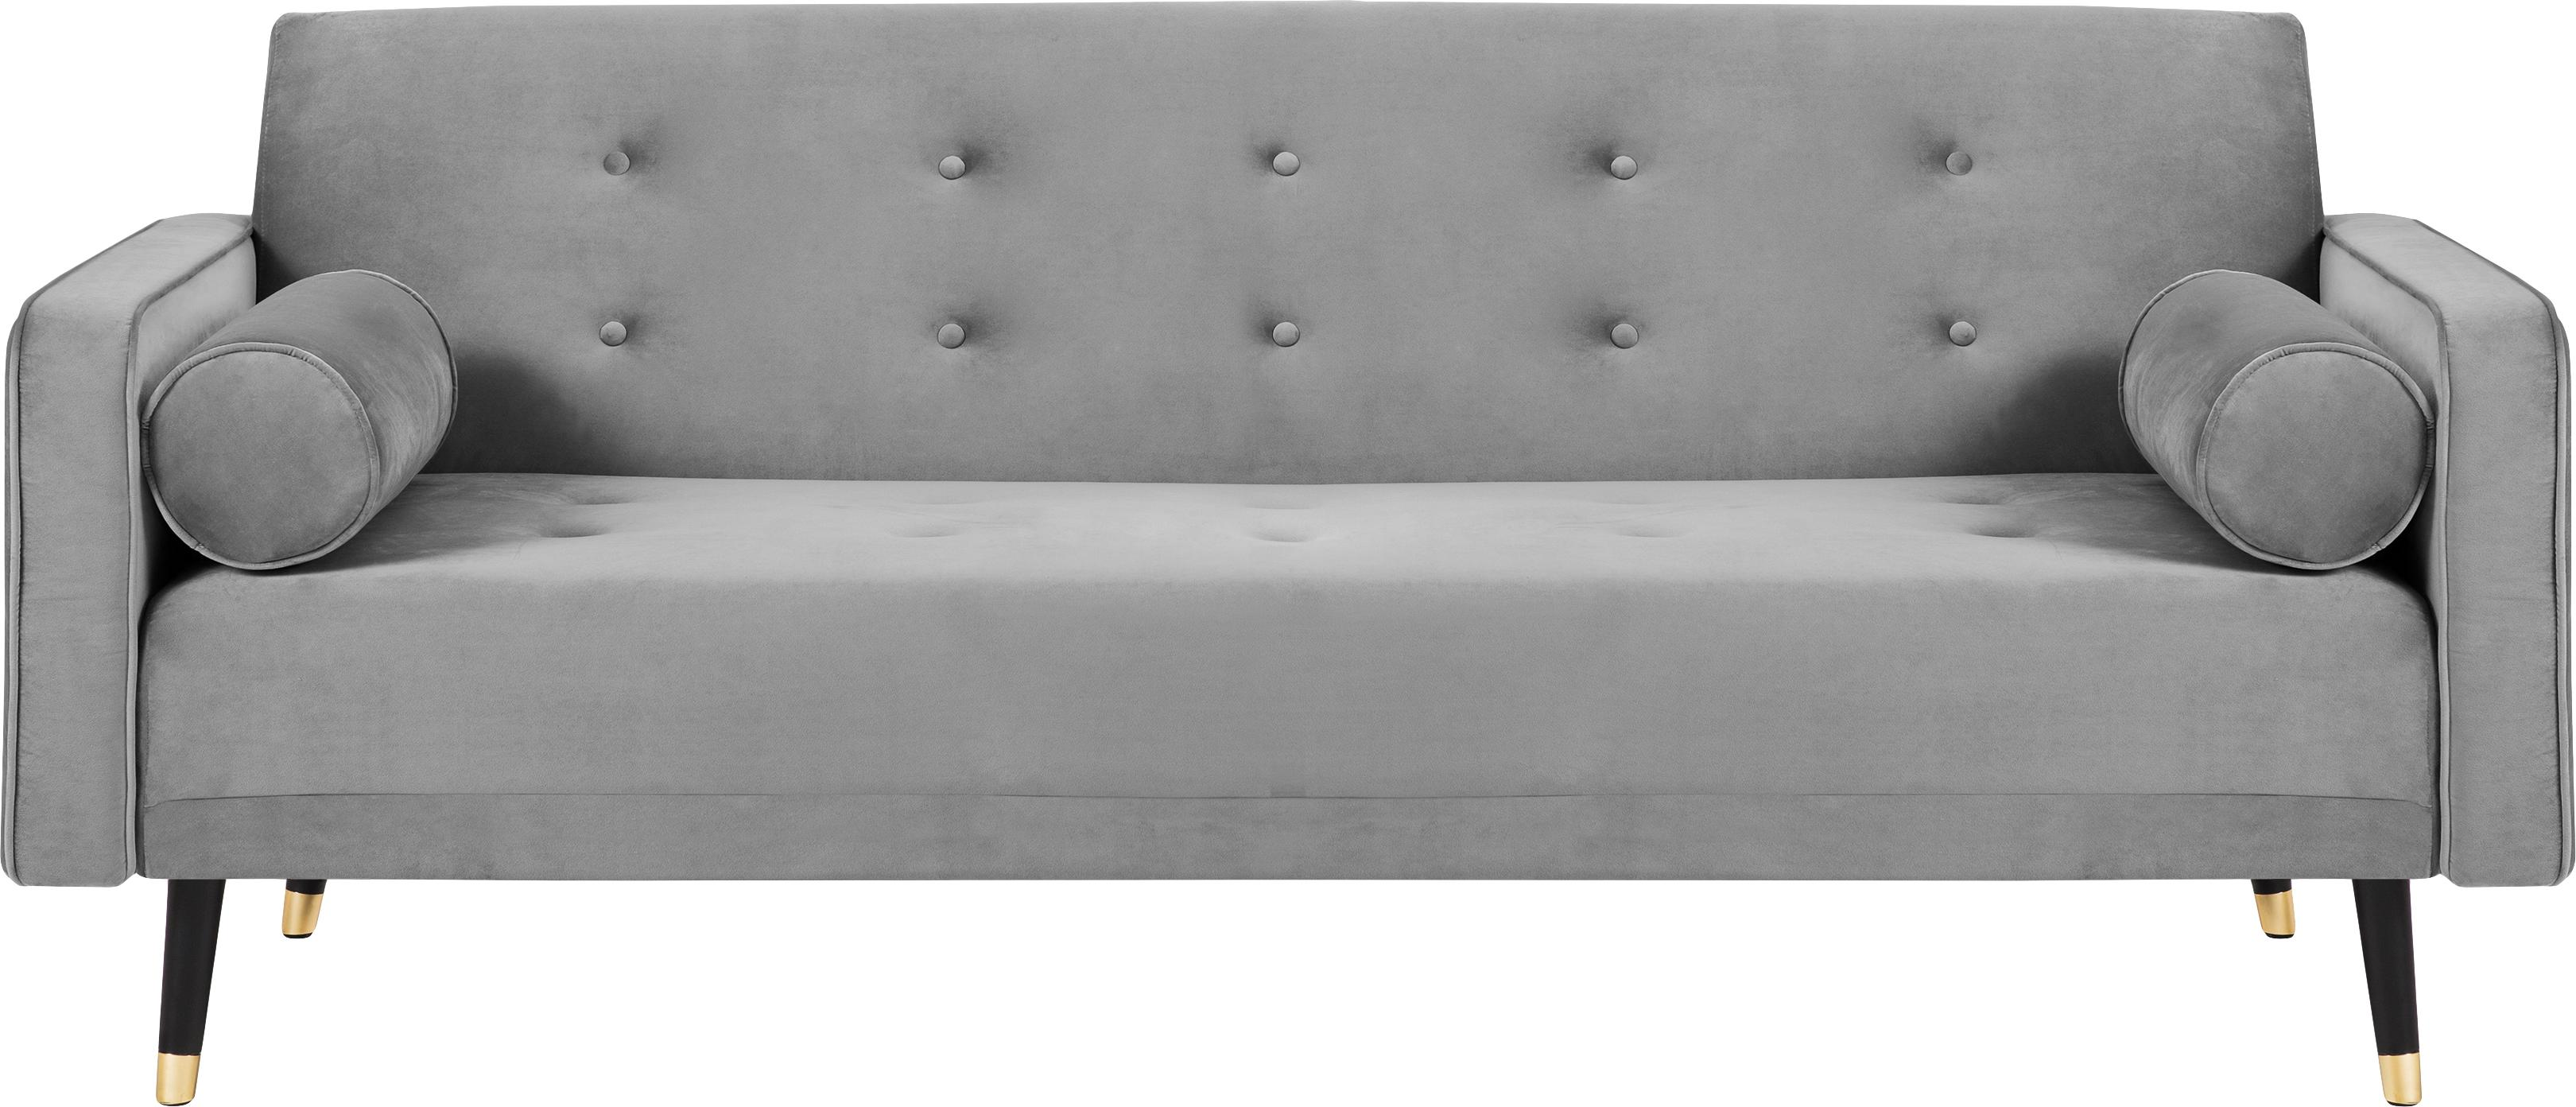 Samt-Schlafsofa Gia (3-Sitzer), Bezug: Polyestersamt, Rahmen: Massives Kiefernholz, Samt Hellgrau, B 212 x T 93 cm